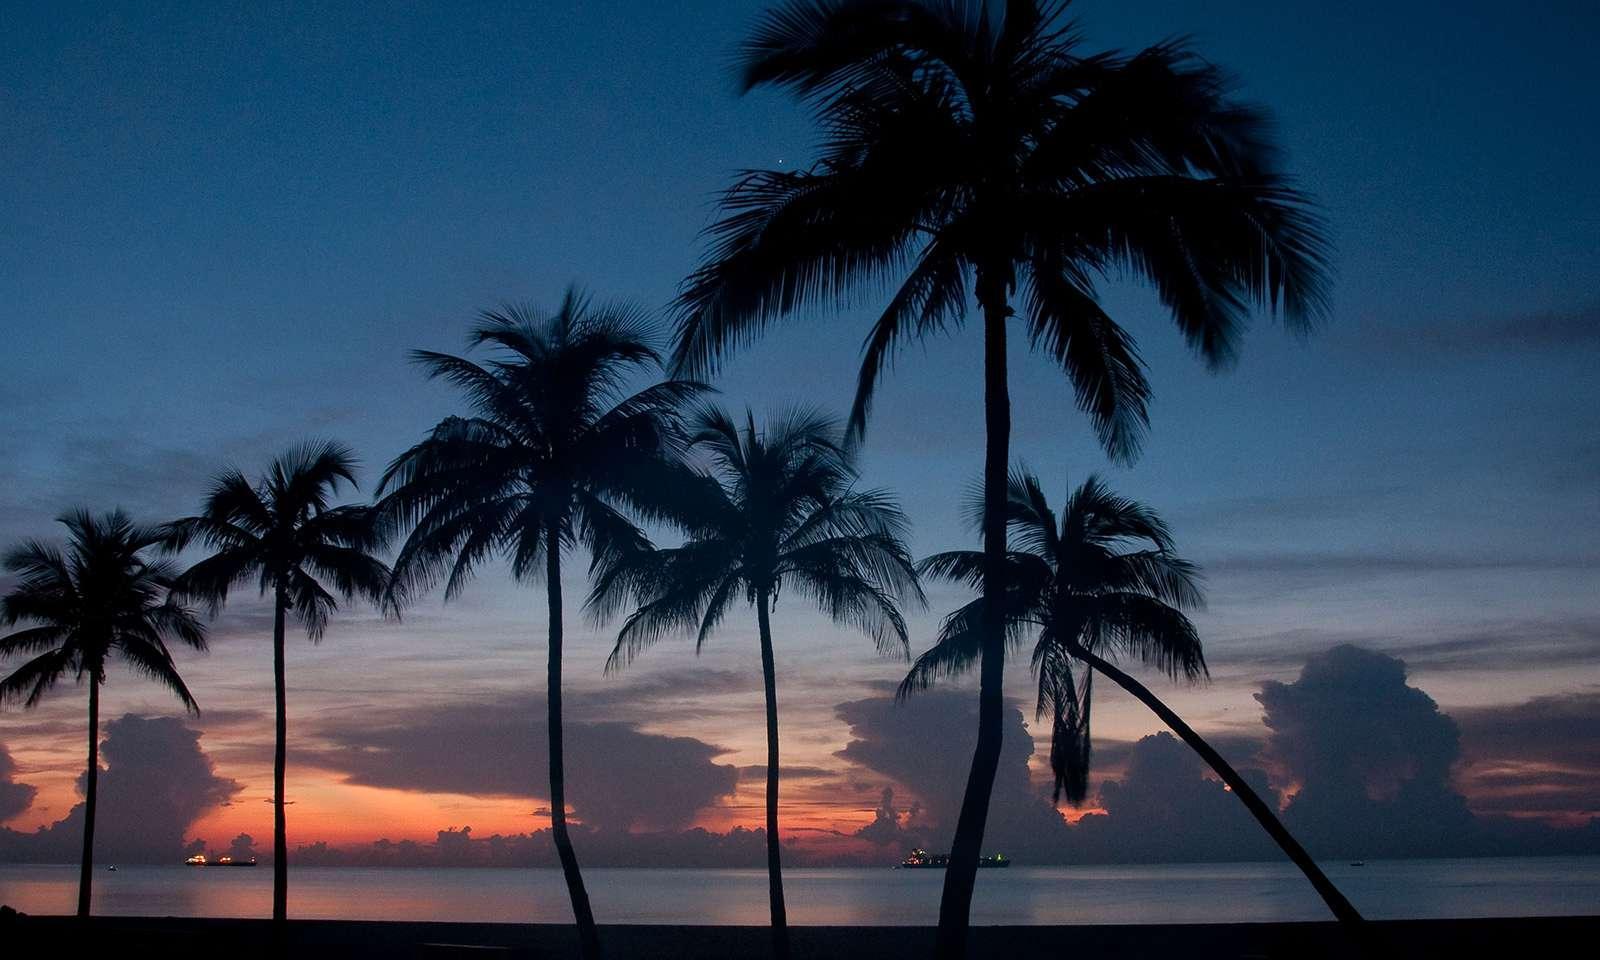 Buscando No Mulheres Livres Fort Lauderdale-91779